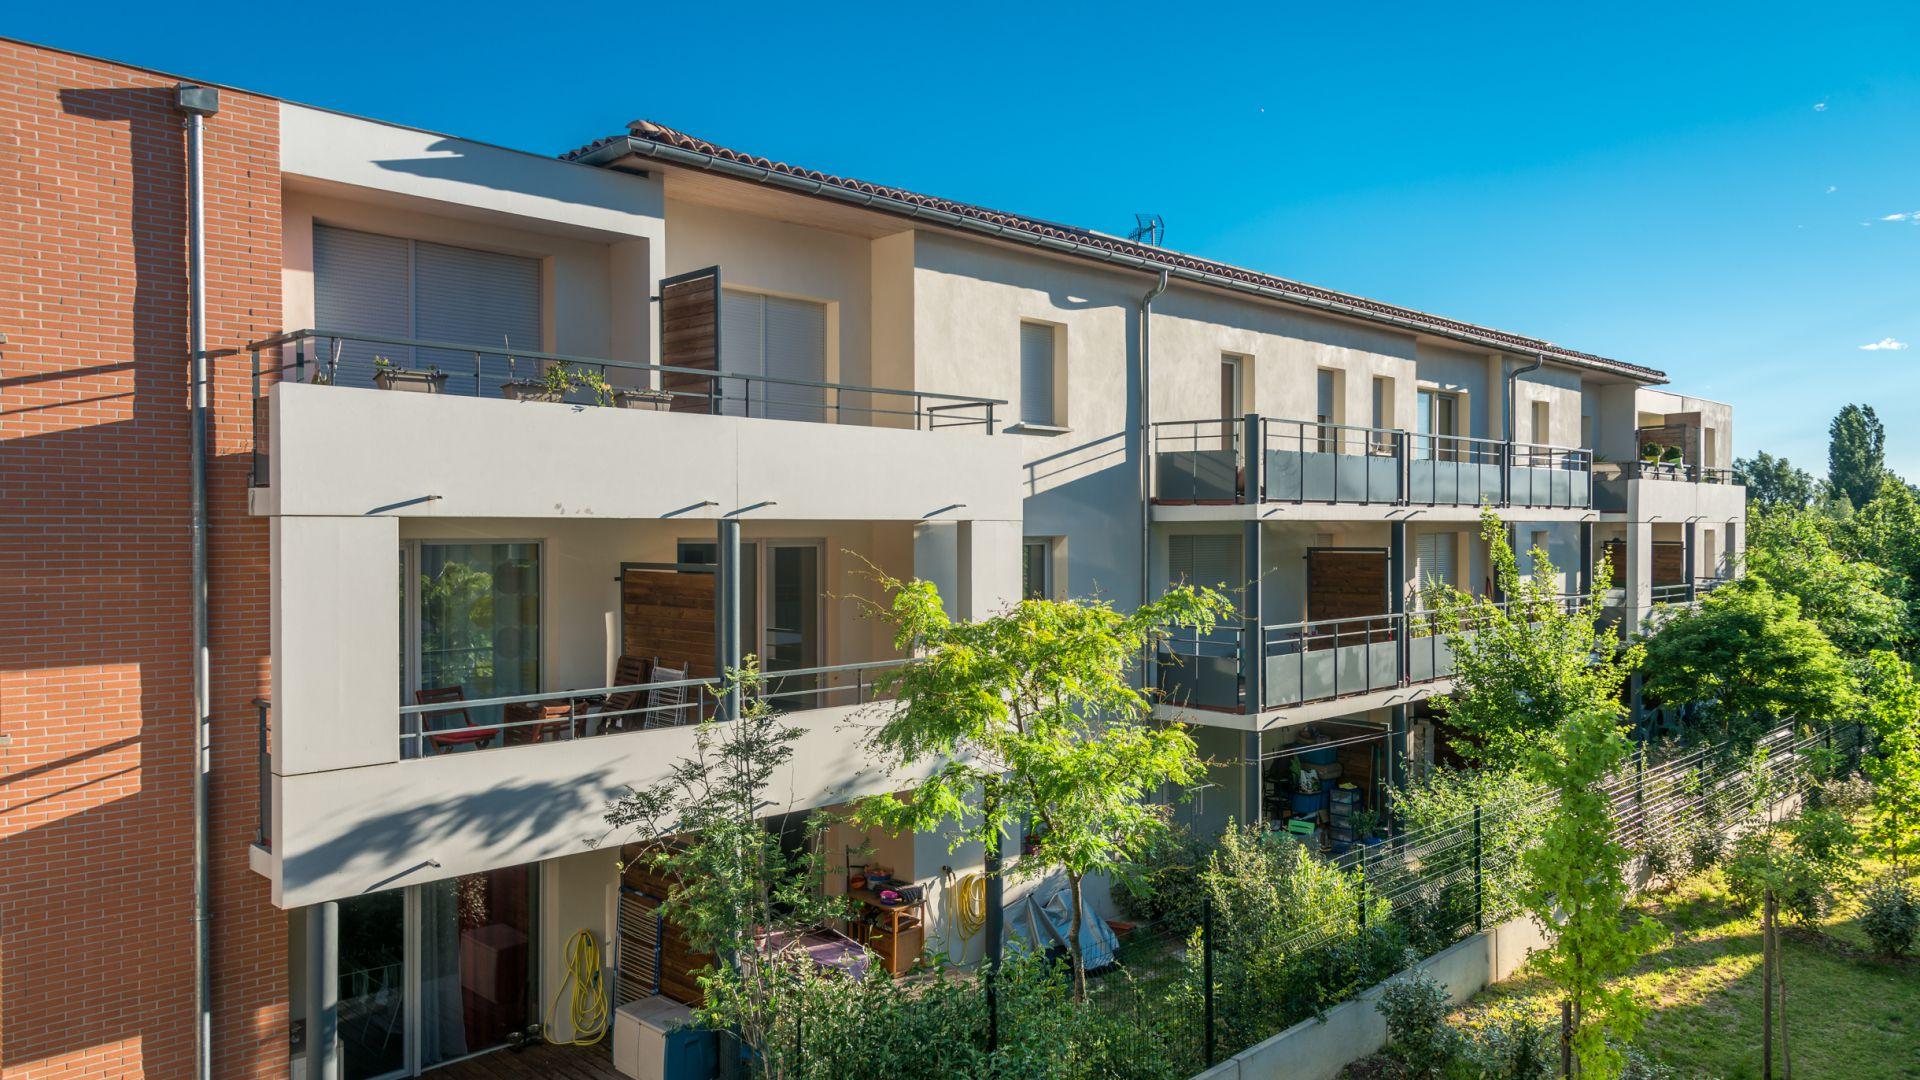 Greencity Immobilier - Résidence Carré Tolosan - 31320 Castanet-Tolosan Location